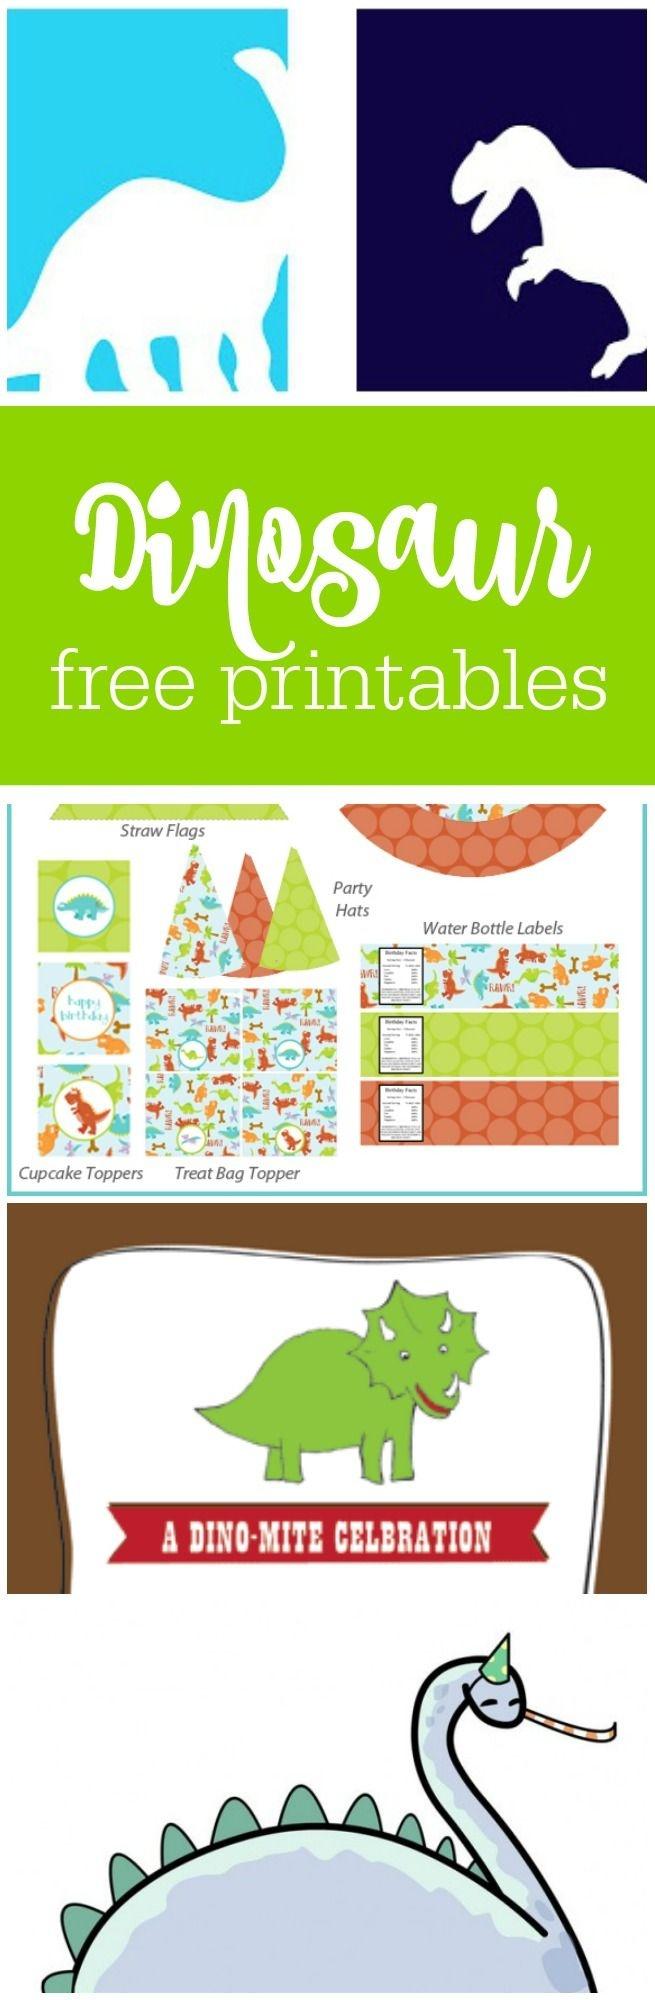 Freebie Friday: Free Dinosaur Party Printables | Baby Ninjas Bday - Free Printable Dinosaur Labels